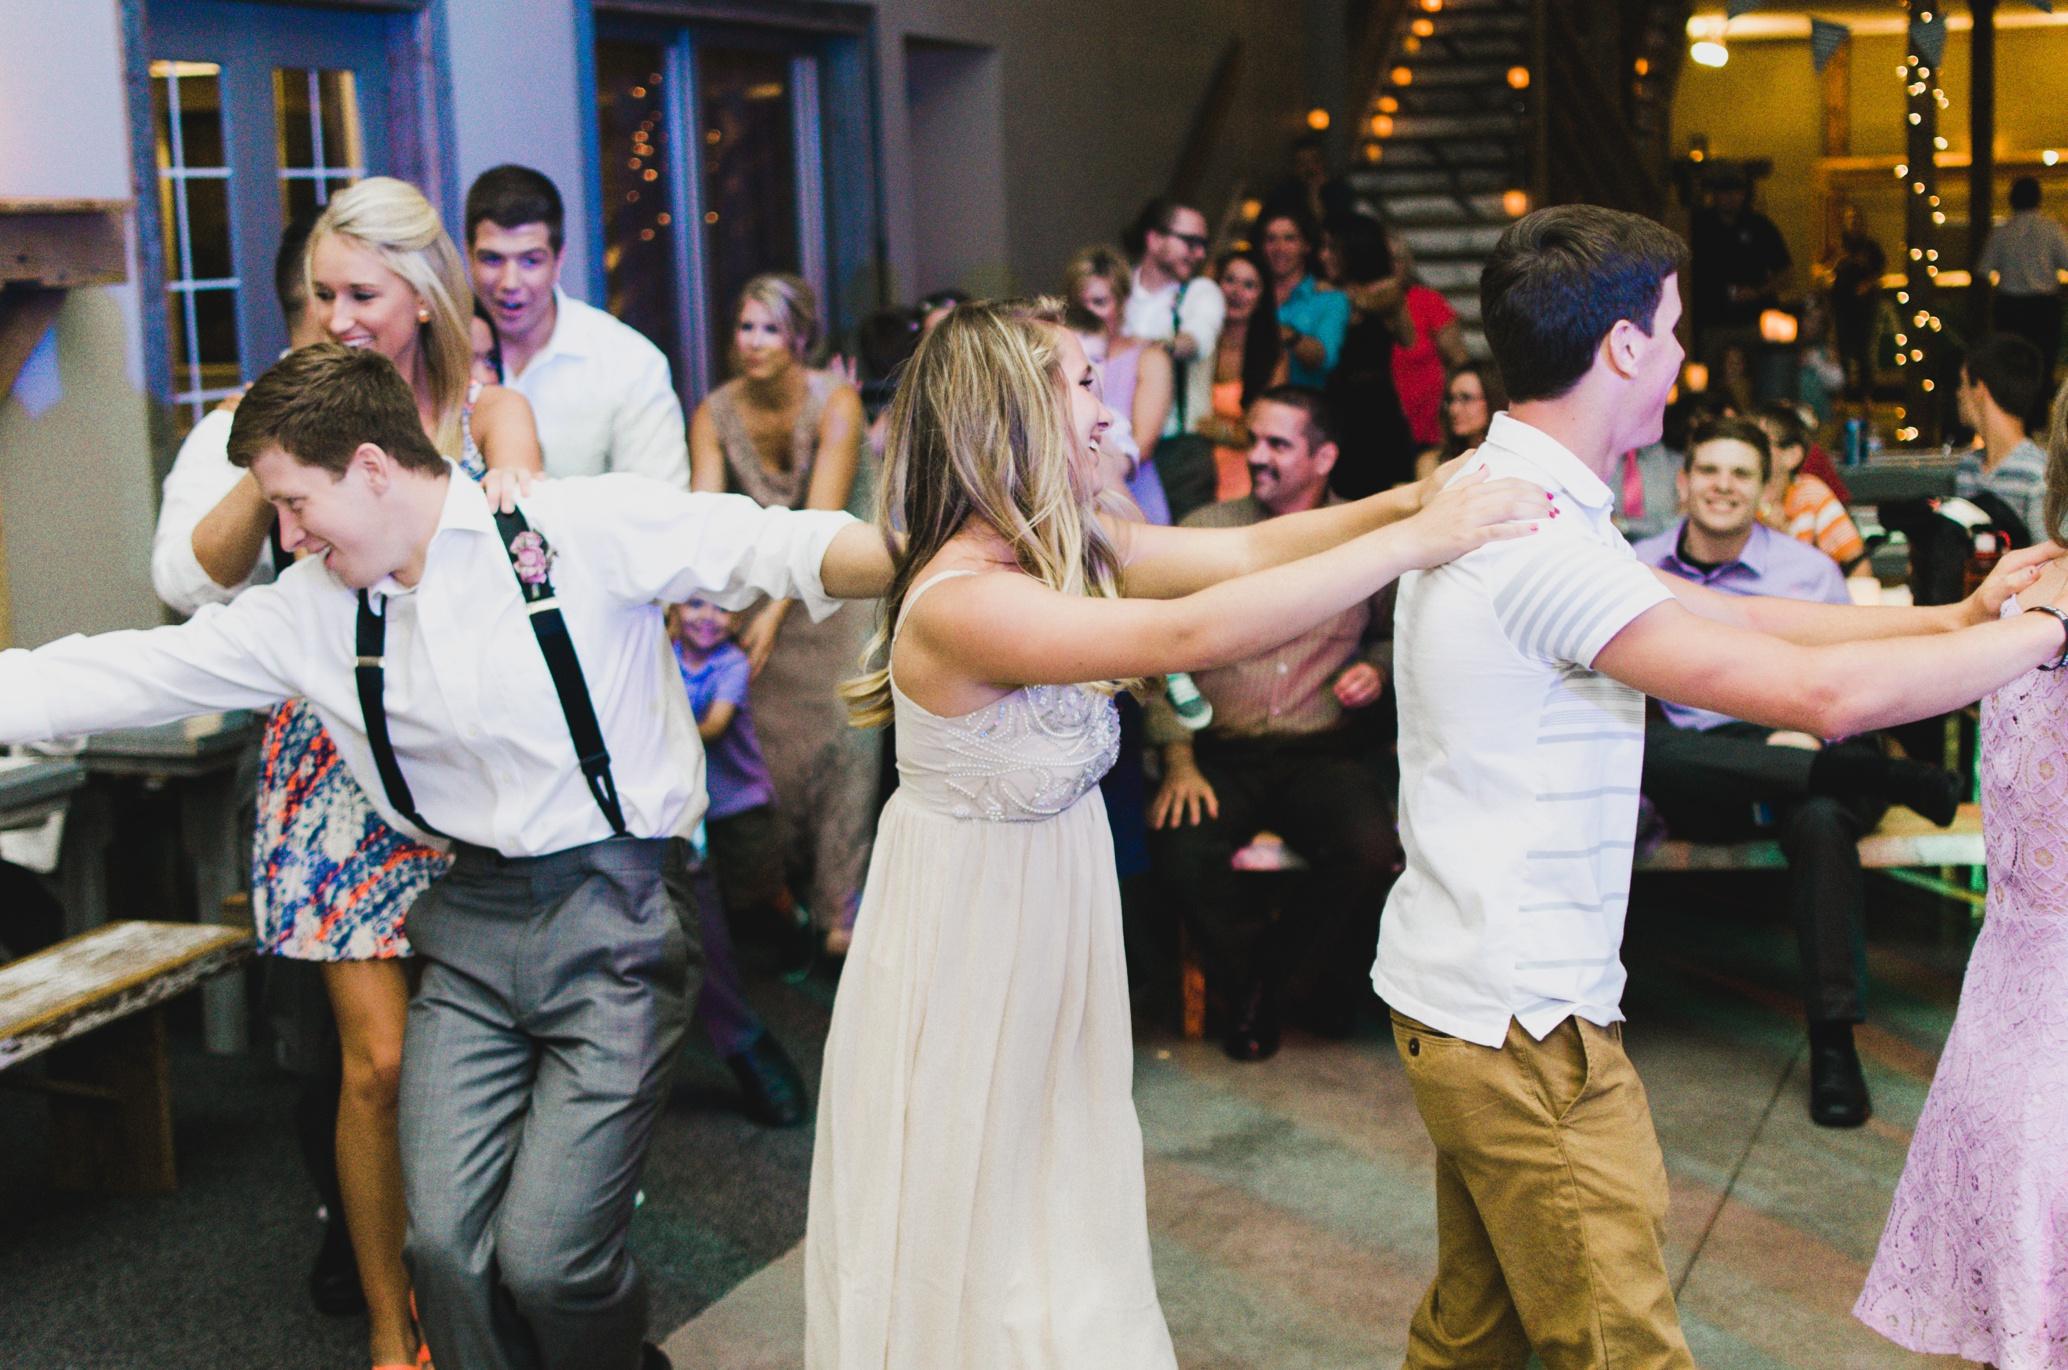 Barnes' Place Rustic Outdoor Wedding | Ali Leigh Photo Minneapolis Wedding Photographer_0190.jpg